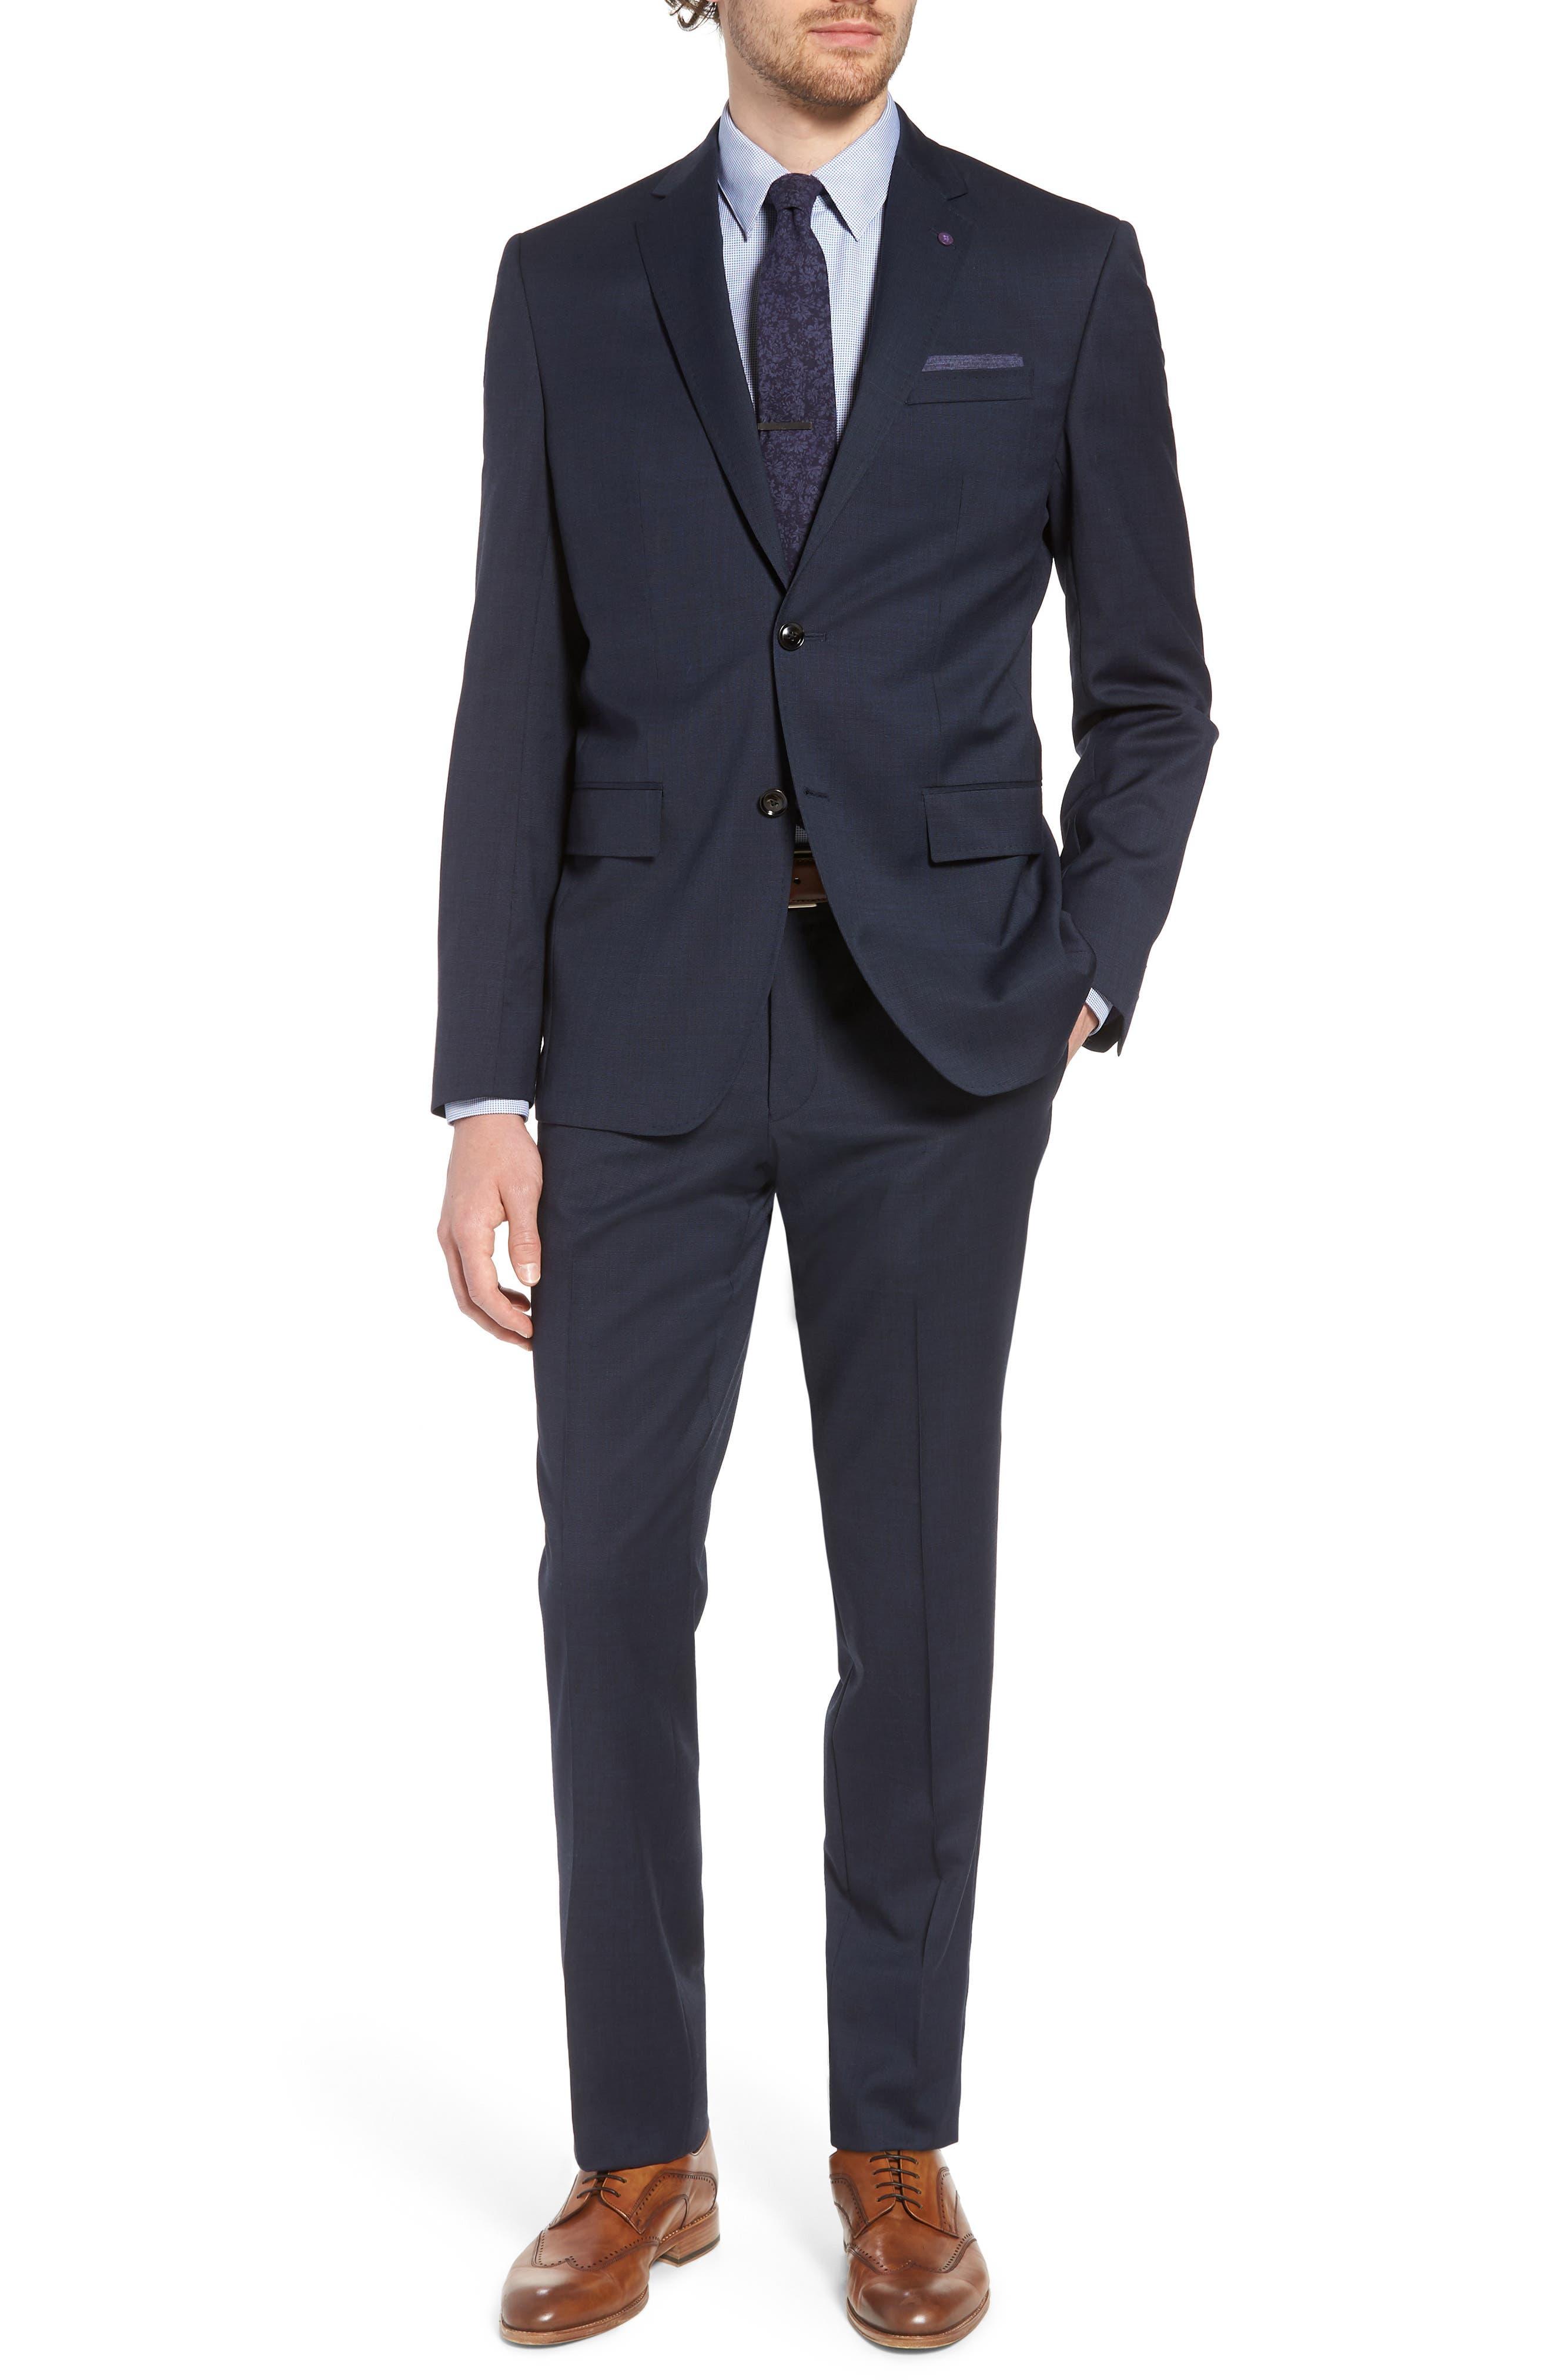 Jay Trim Fit Solid Wool Suit,                             Main thumbnail 1, color,